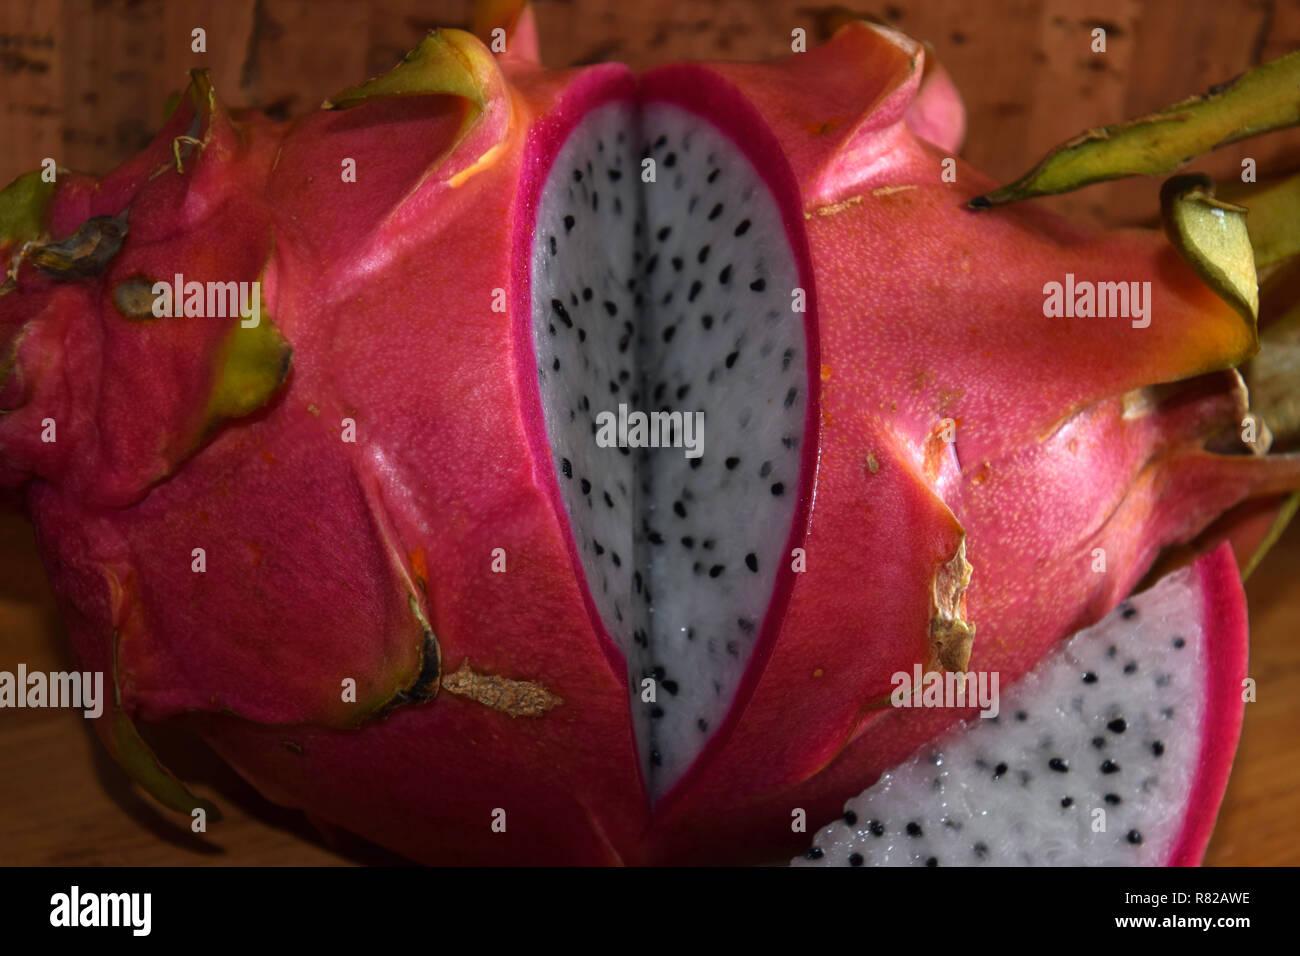 sliced dragon fruit, pitaya blanca or white-fleshed and pink-skinned ripe pitahaya fruit also called hylocereus undatus on wooden table - Stock Image